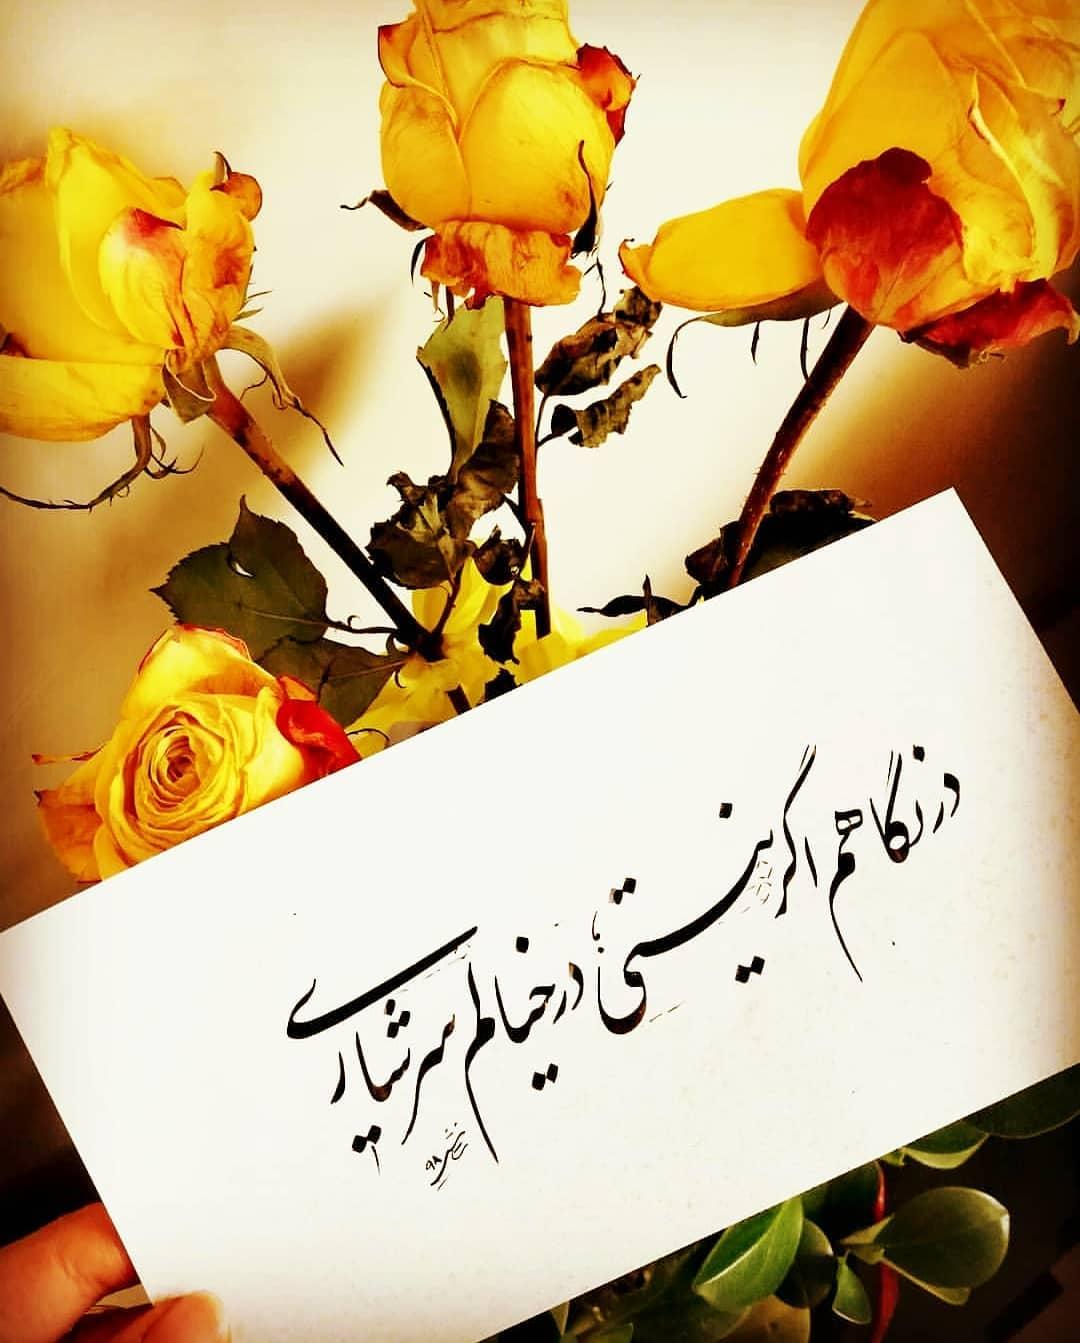 Farisi/Nasta'liq khatestan  ﷽ در نگاهم اگر نیستی؛ در خیالم سرشاری . #خطستان  @khatestan #خط_خودکاری#خط_خودک… 2193